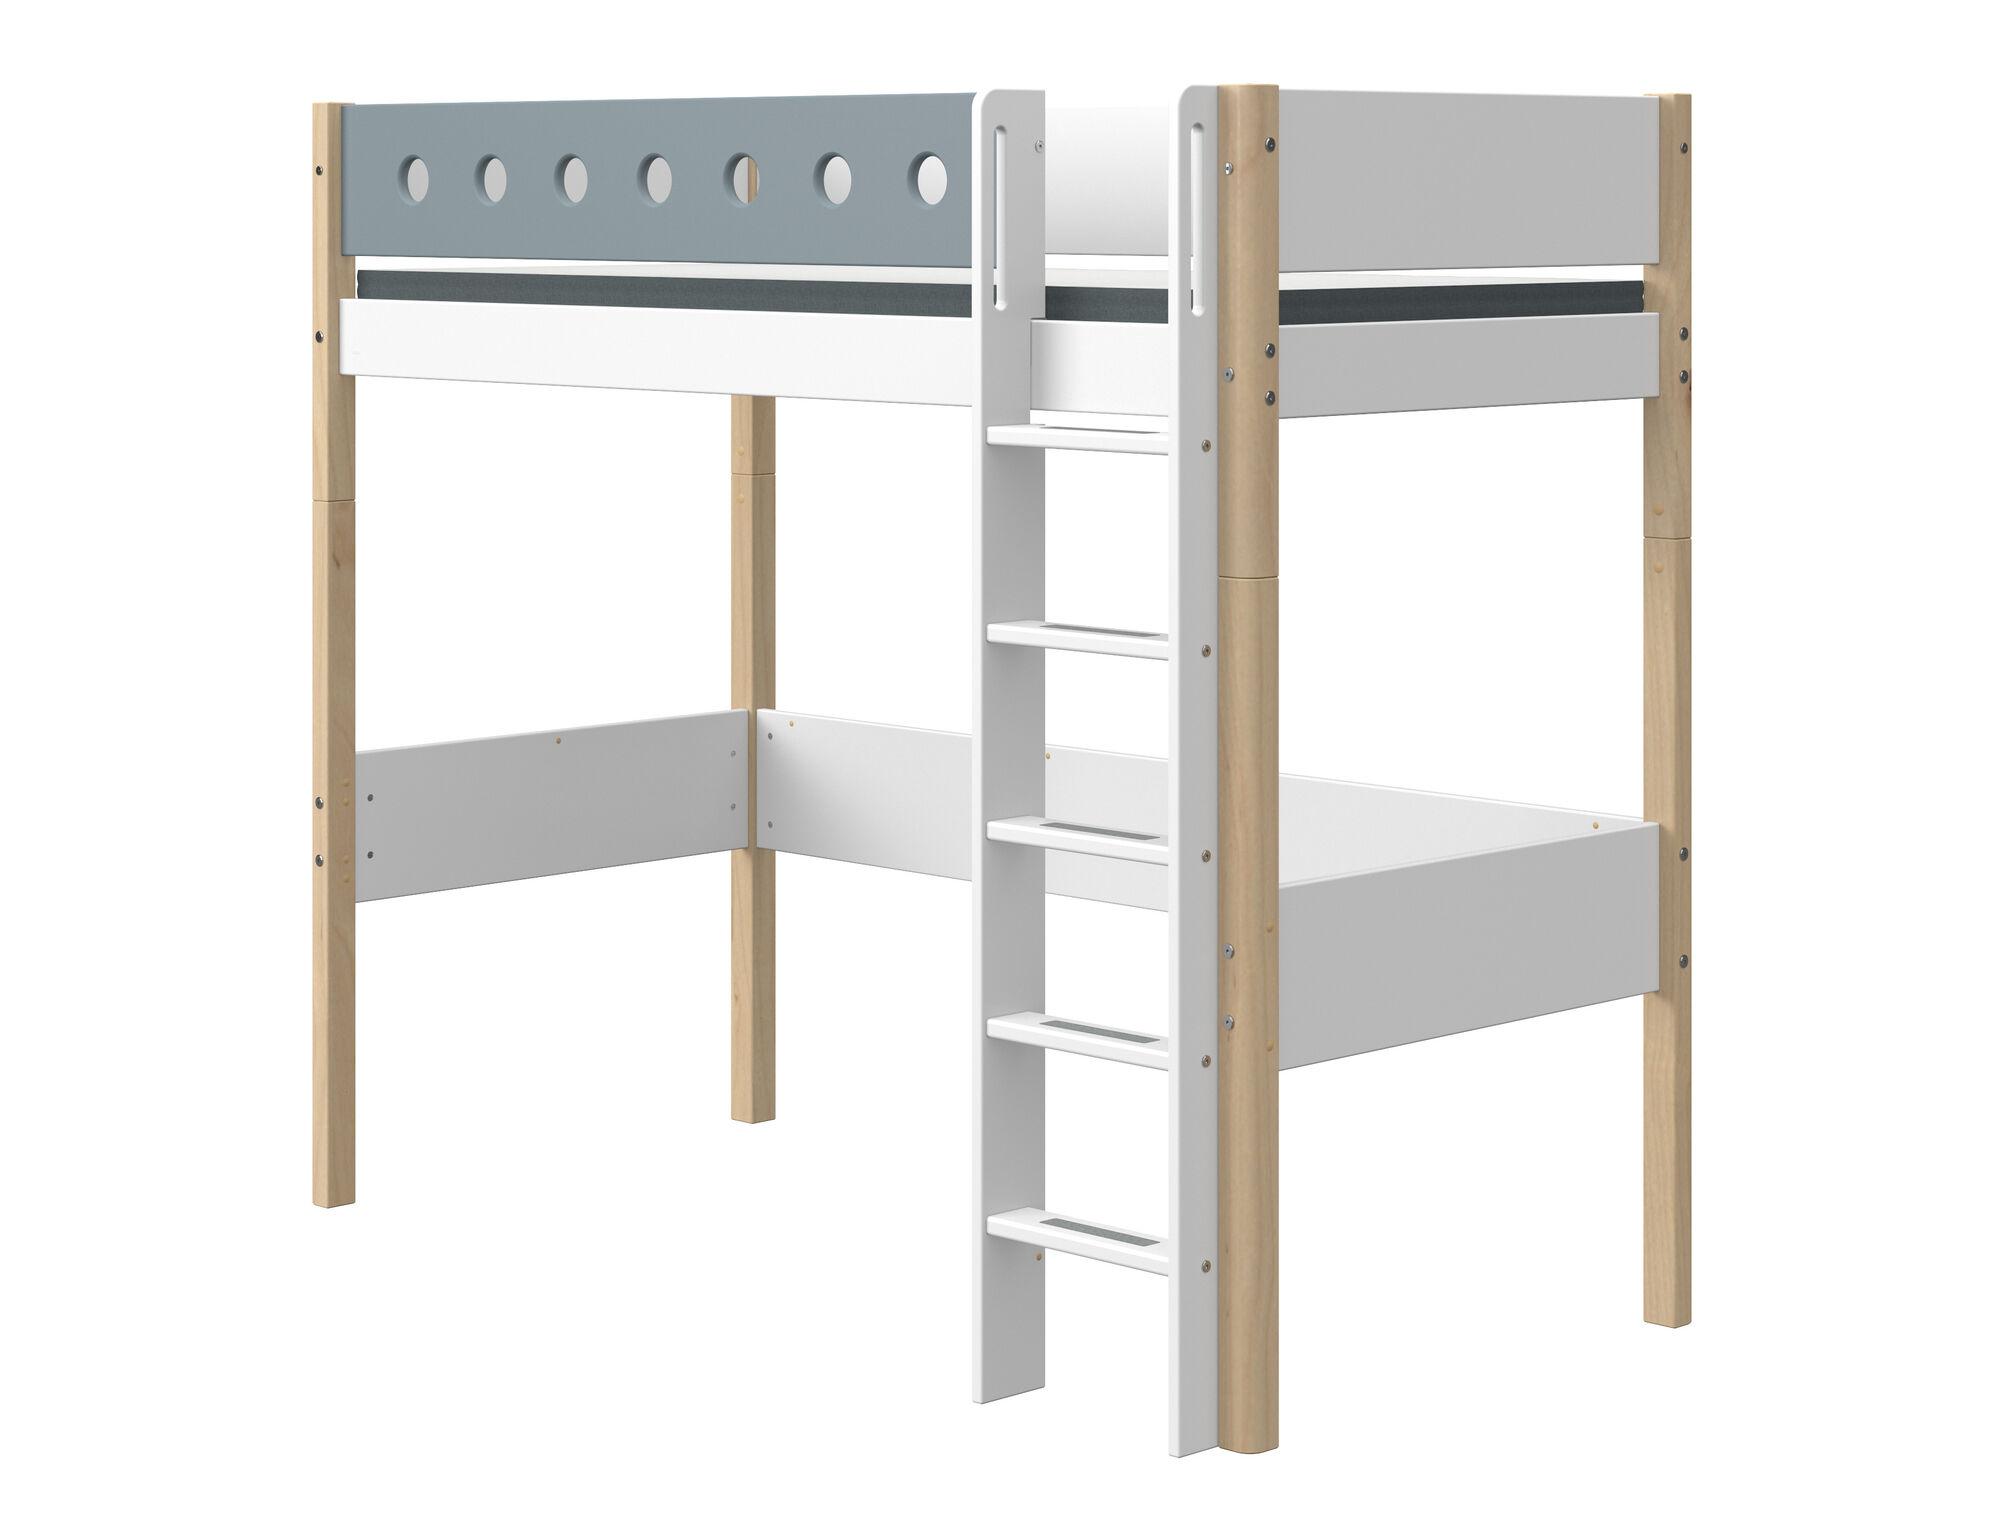 Flexa White Hoogslaper Blank 90 x 200 cm + Rechte Ladder + Uitvalbeveiliging Blauw